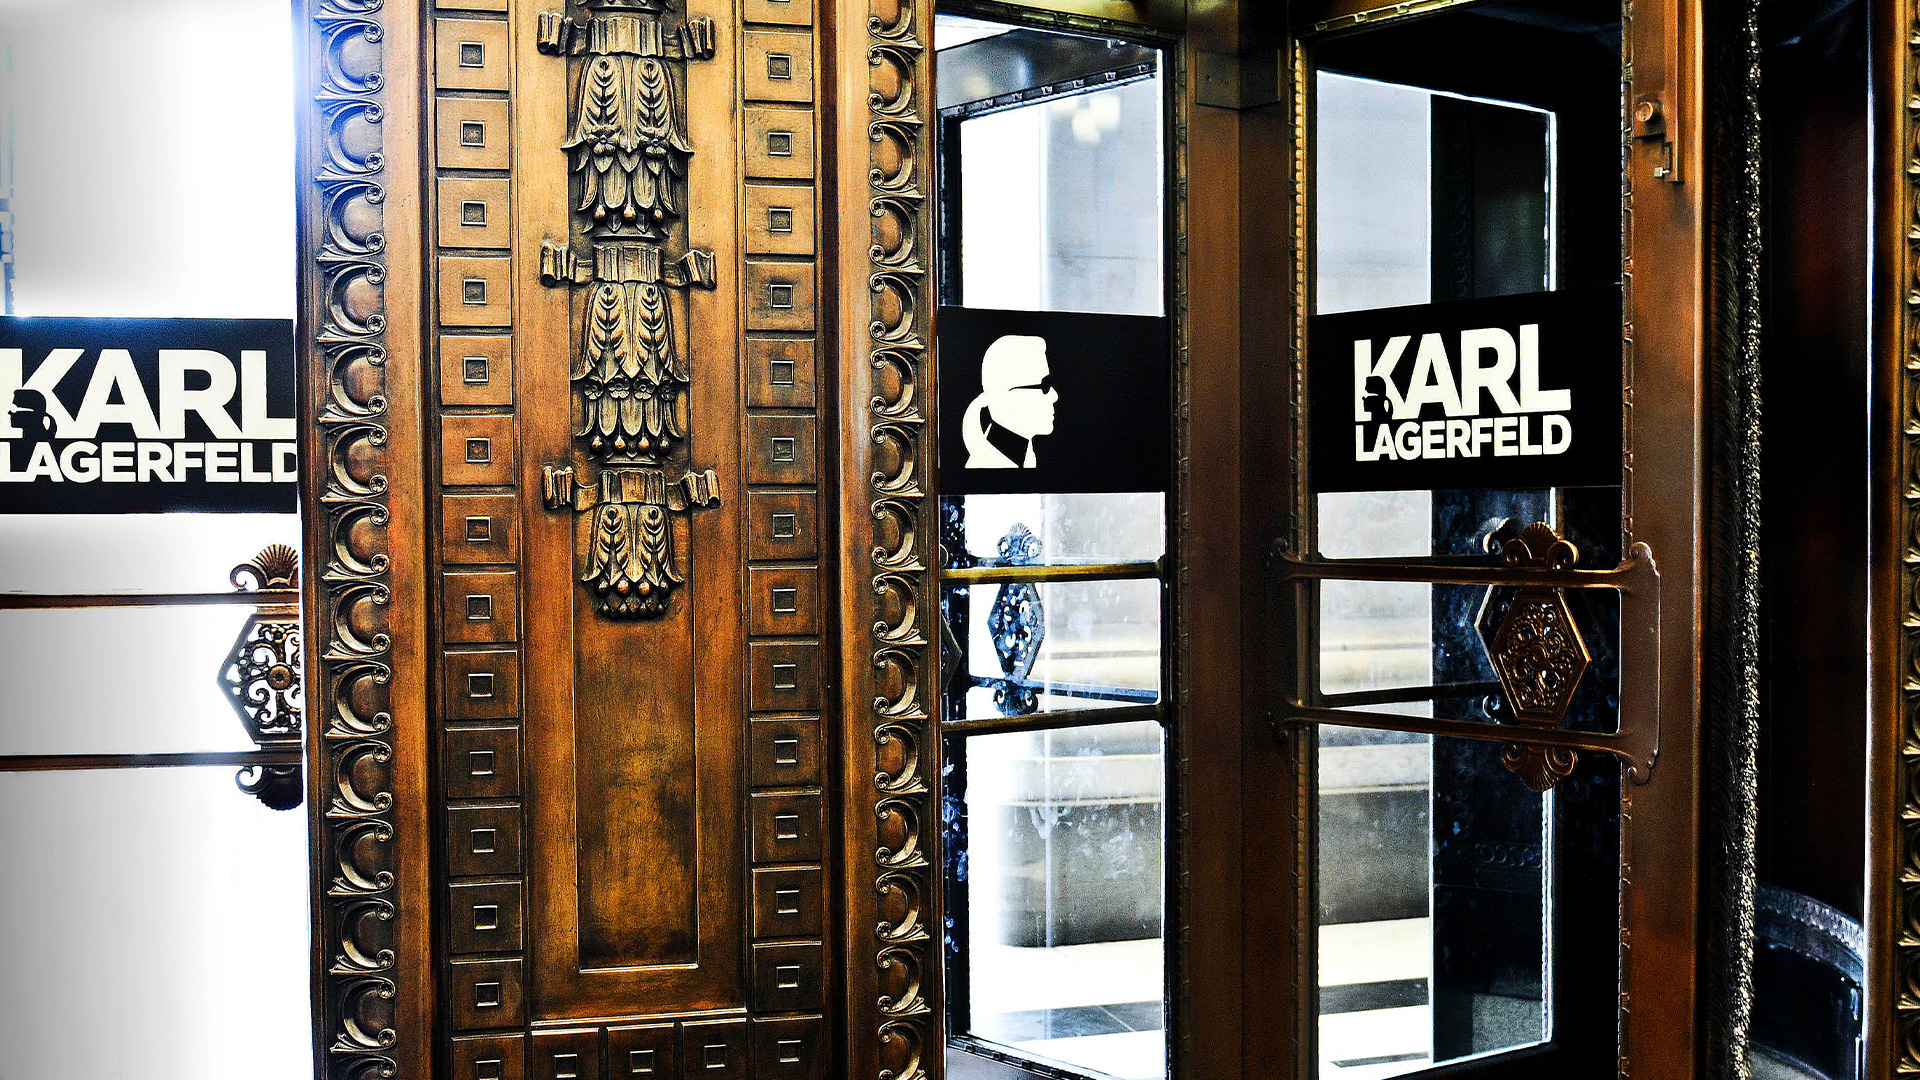 LIGANOVA | Karl Lagerfeld | POS Campaign – Special Window & Instore Installation | Insights